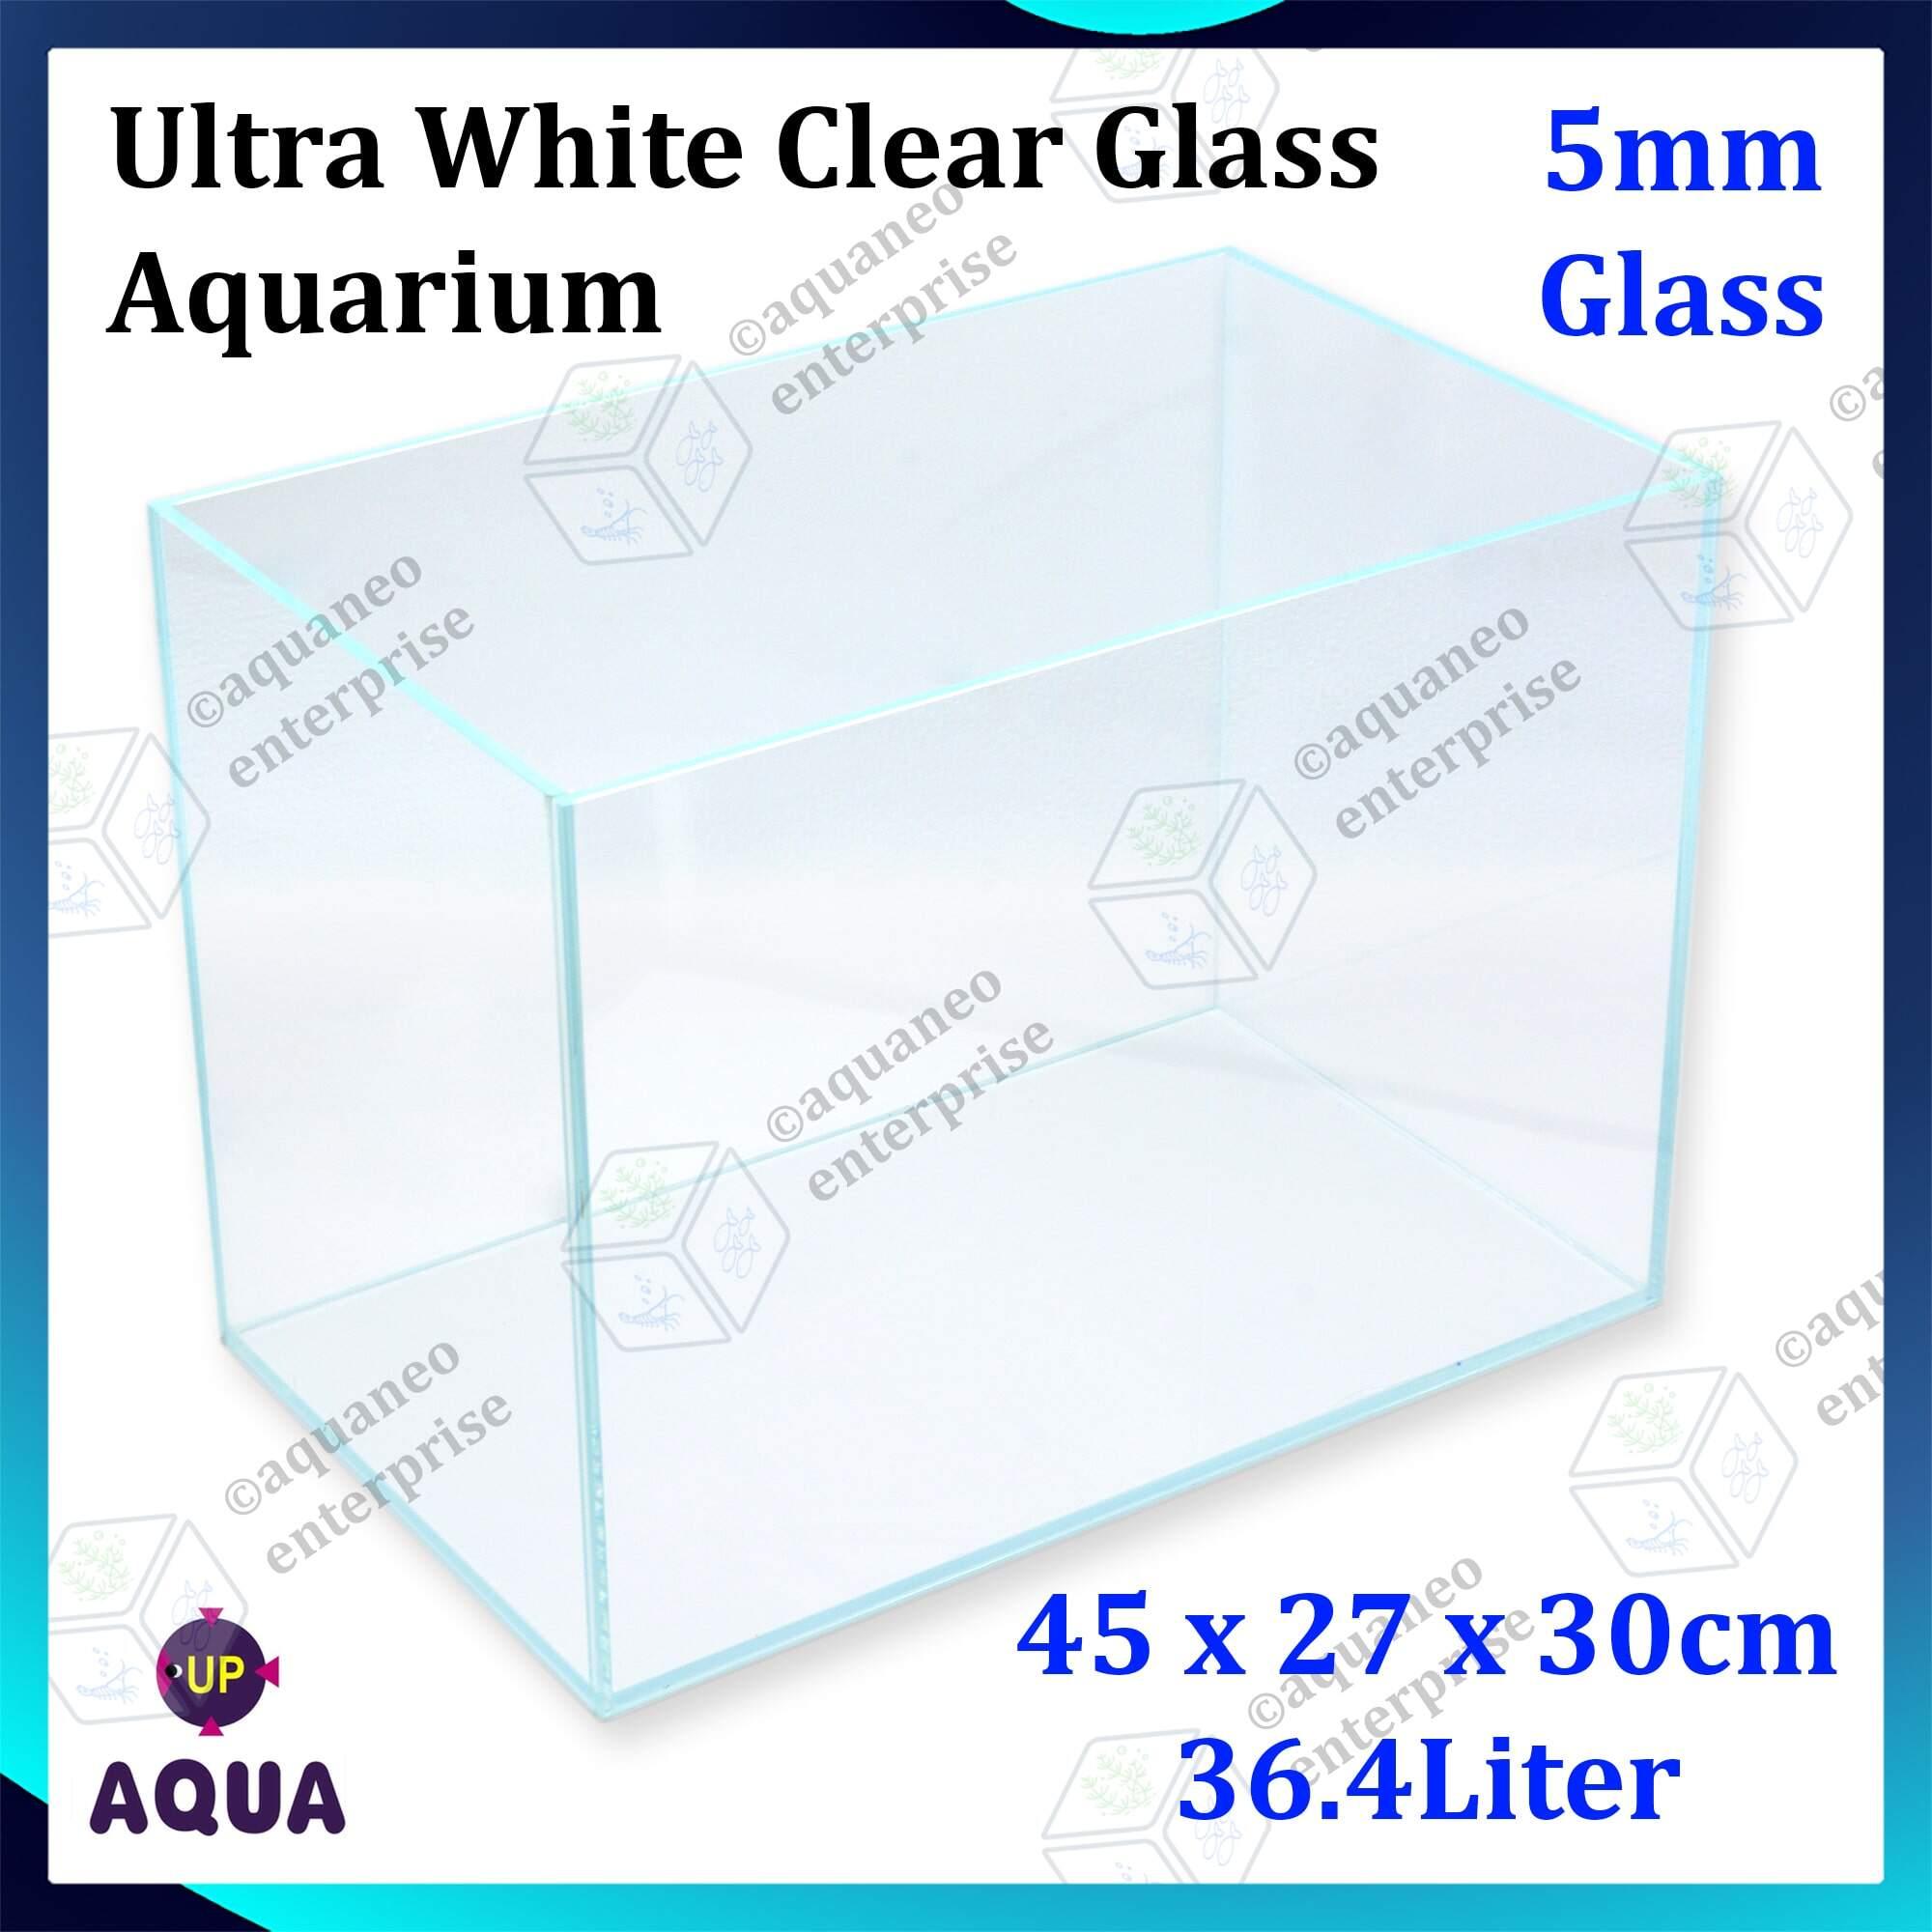 Up Aqua Ultra White Clear Glass Aquarium 45cm